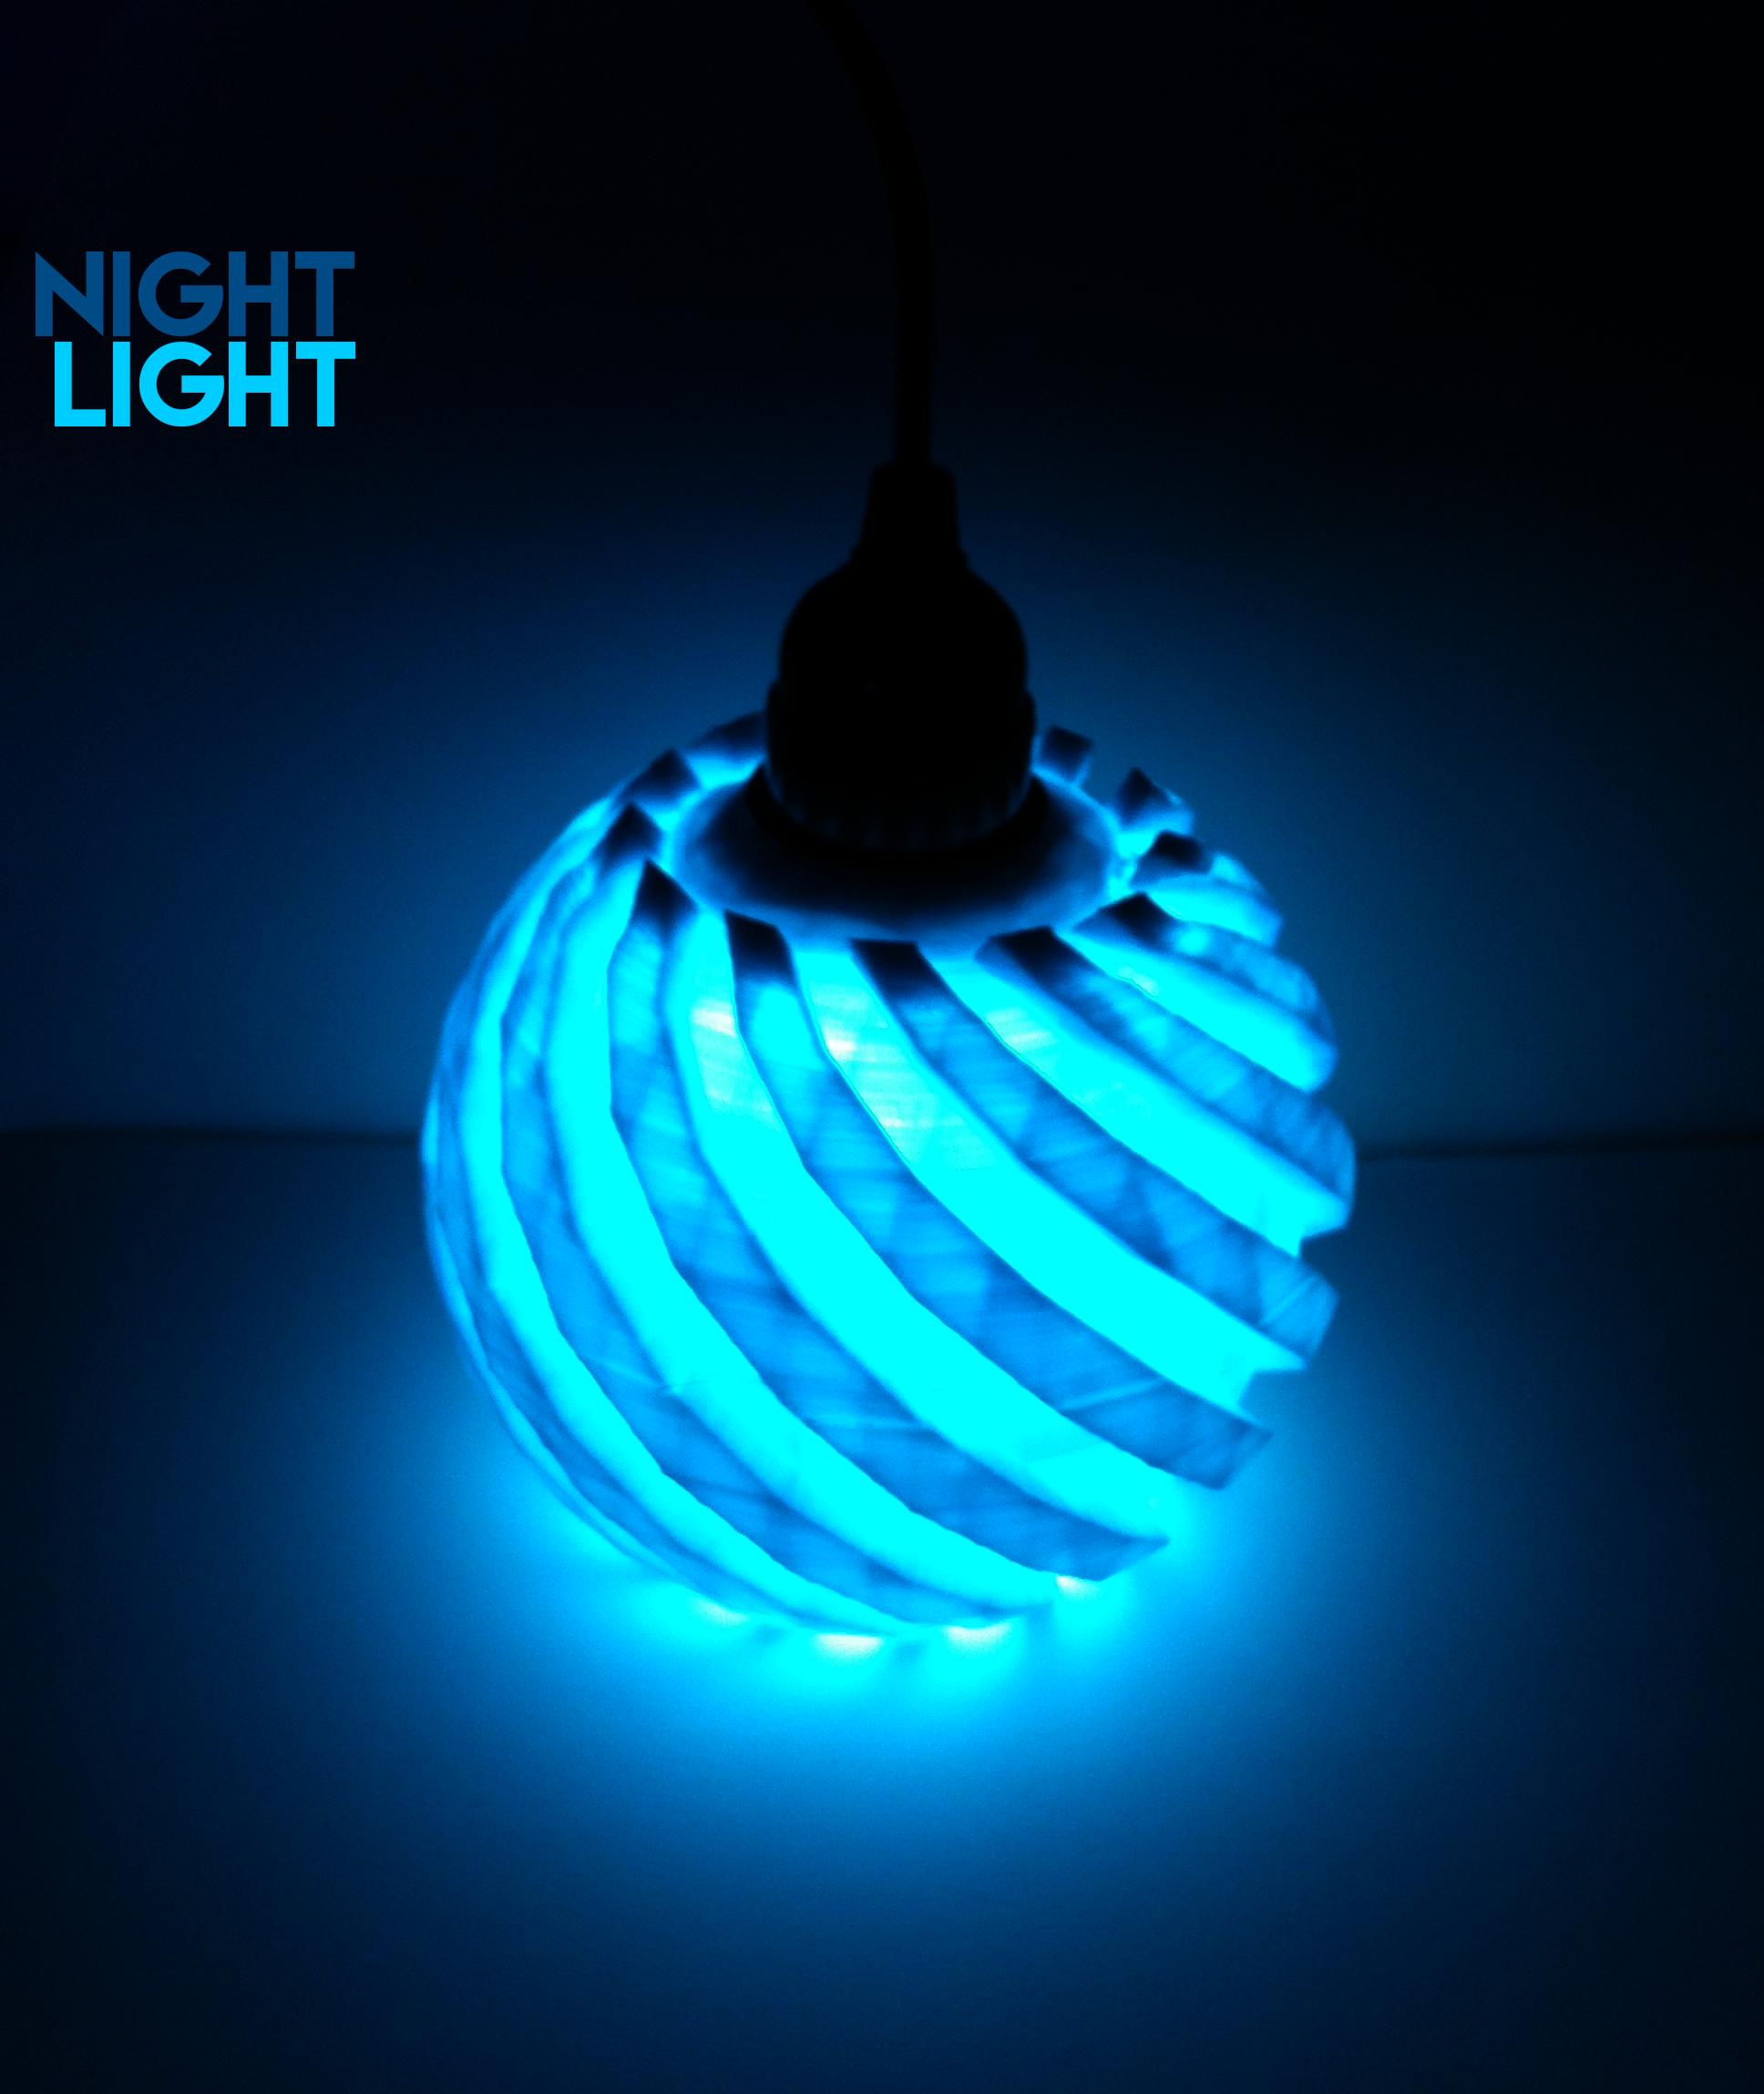 NightLight.png Download free STL file Night Light • 3D printing model, ThomasRaygasse